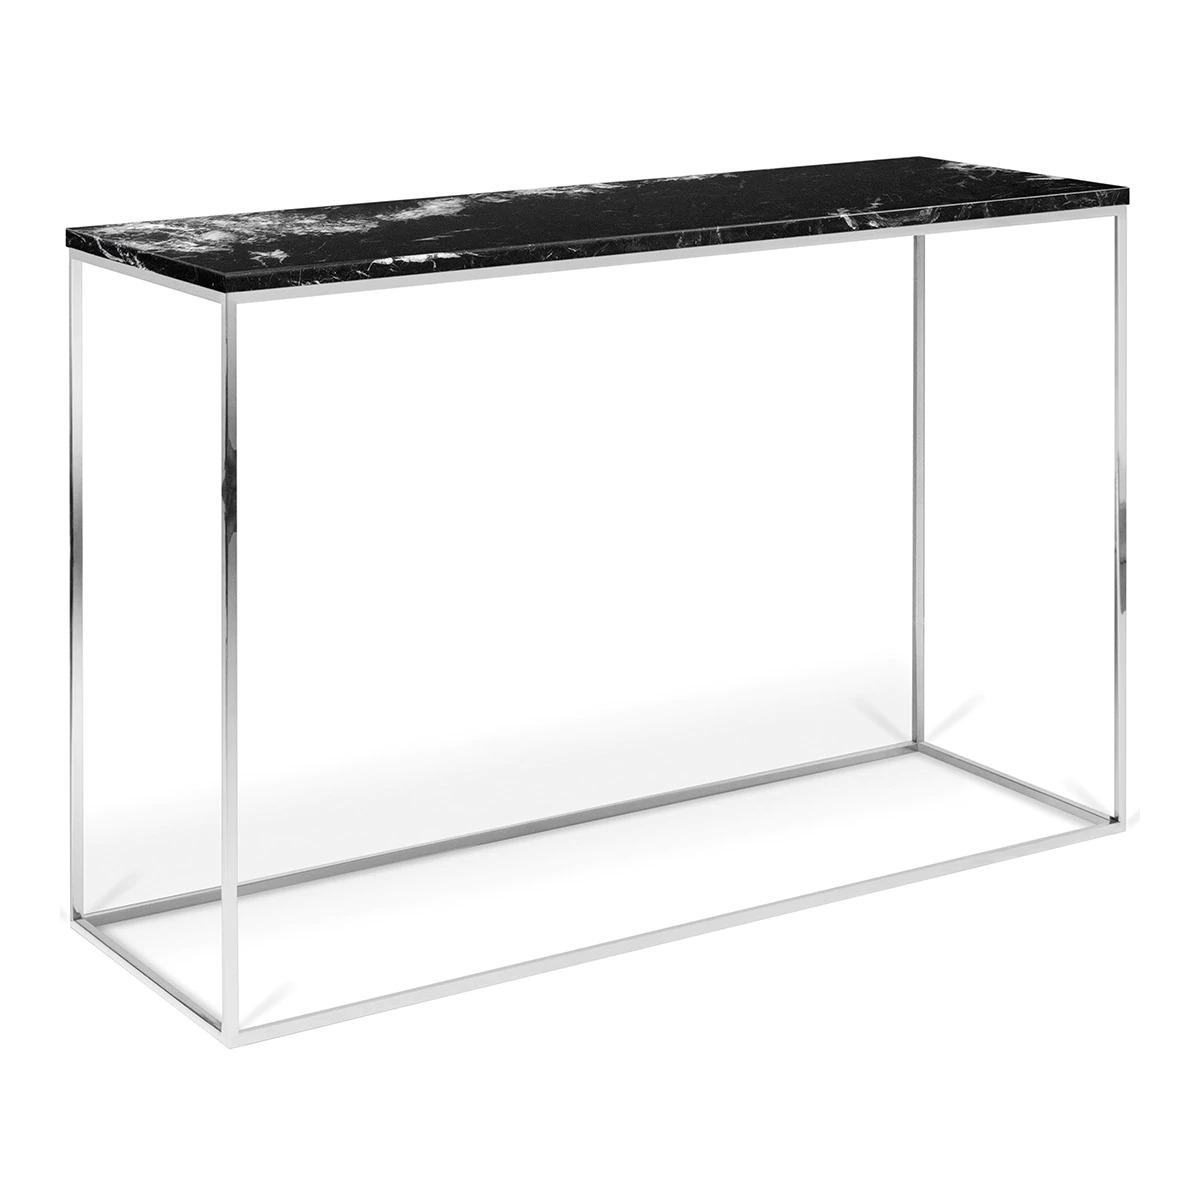 Marble console with chrome structure Astoria Room - El Corte Inglés